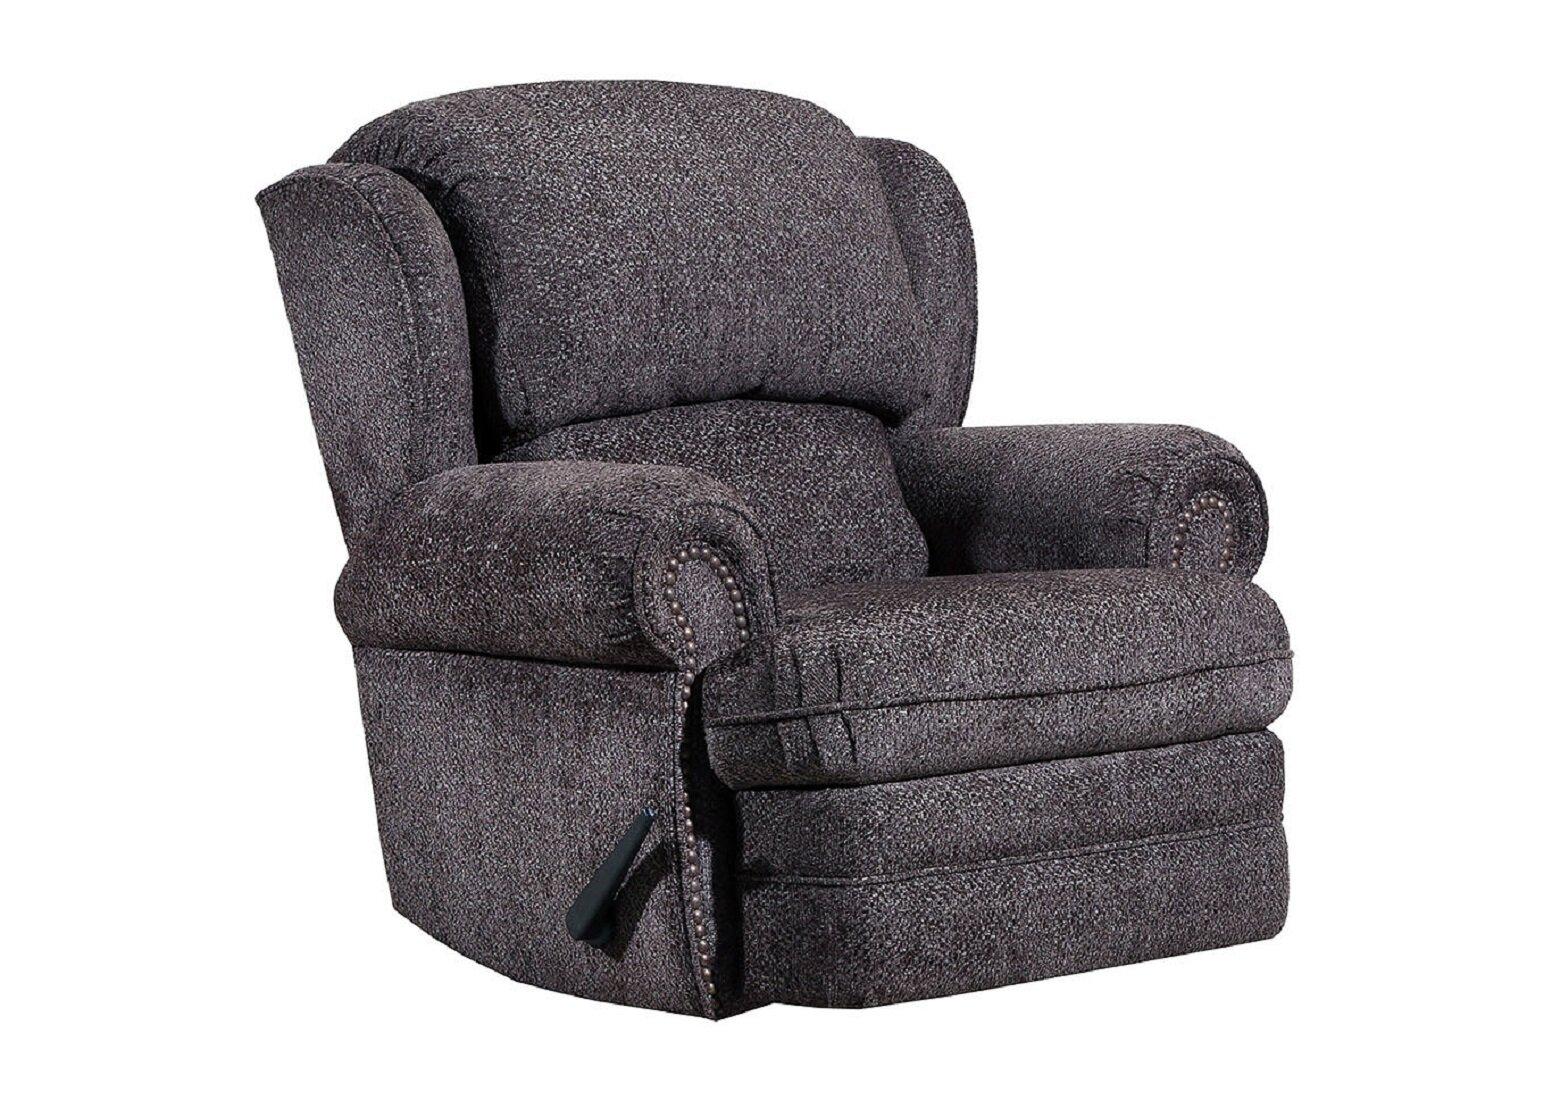 Chair Open Box Recliners You Ll Love In 2021 Wayfair